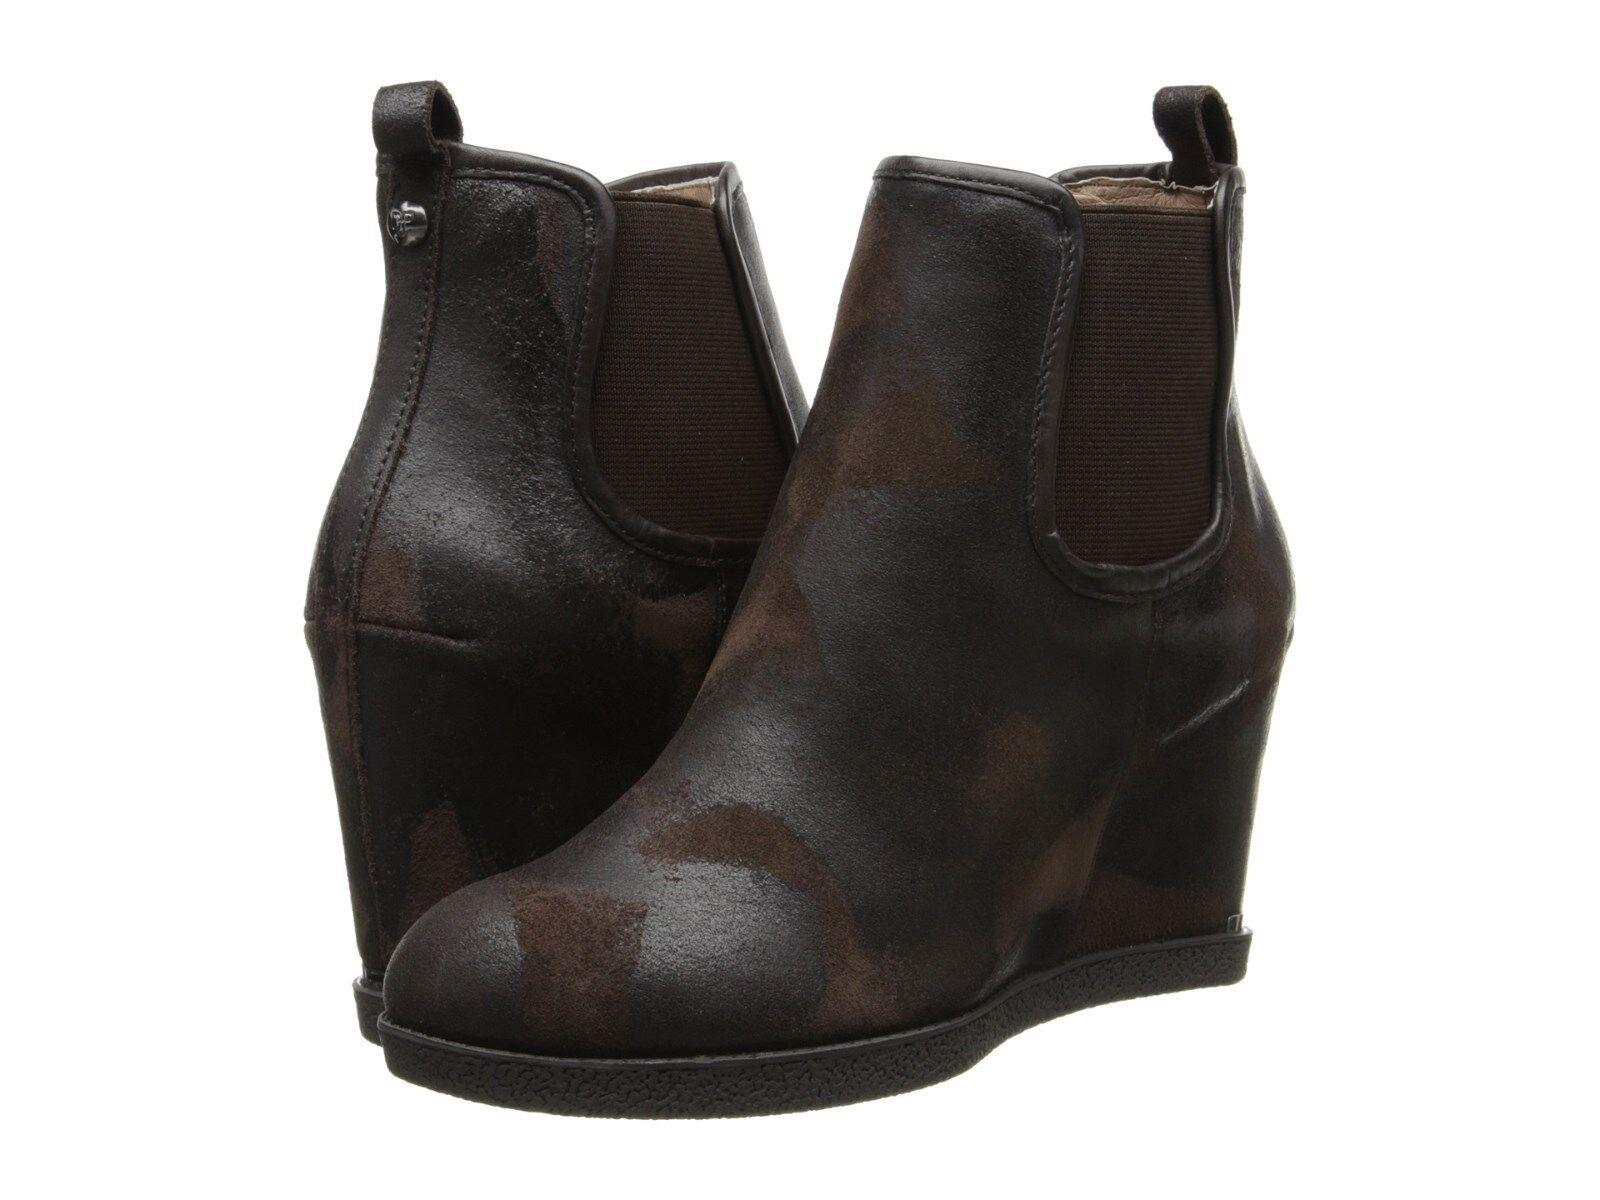 Donald J  Pliner Dillon Vintage Sue de Fashion Ankle stivali donna Expresso 9.5 NIB  designer online